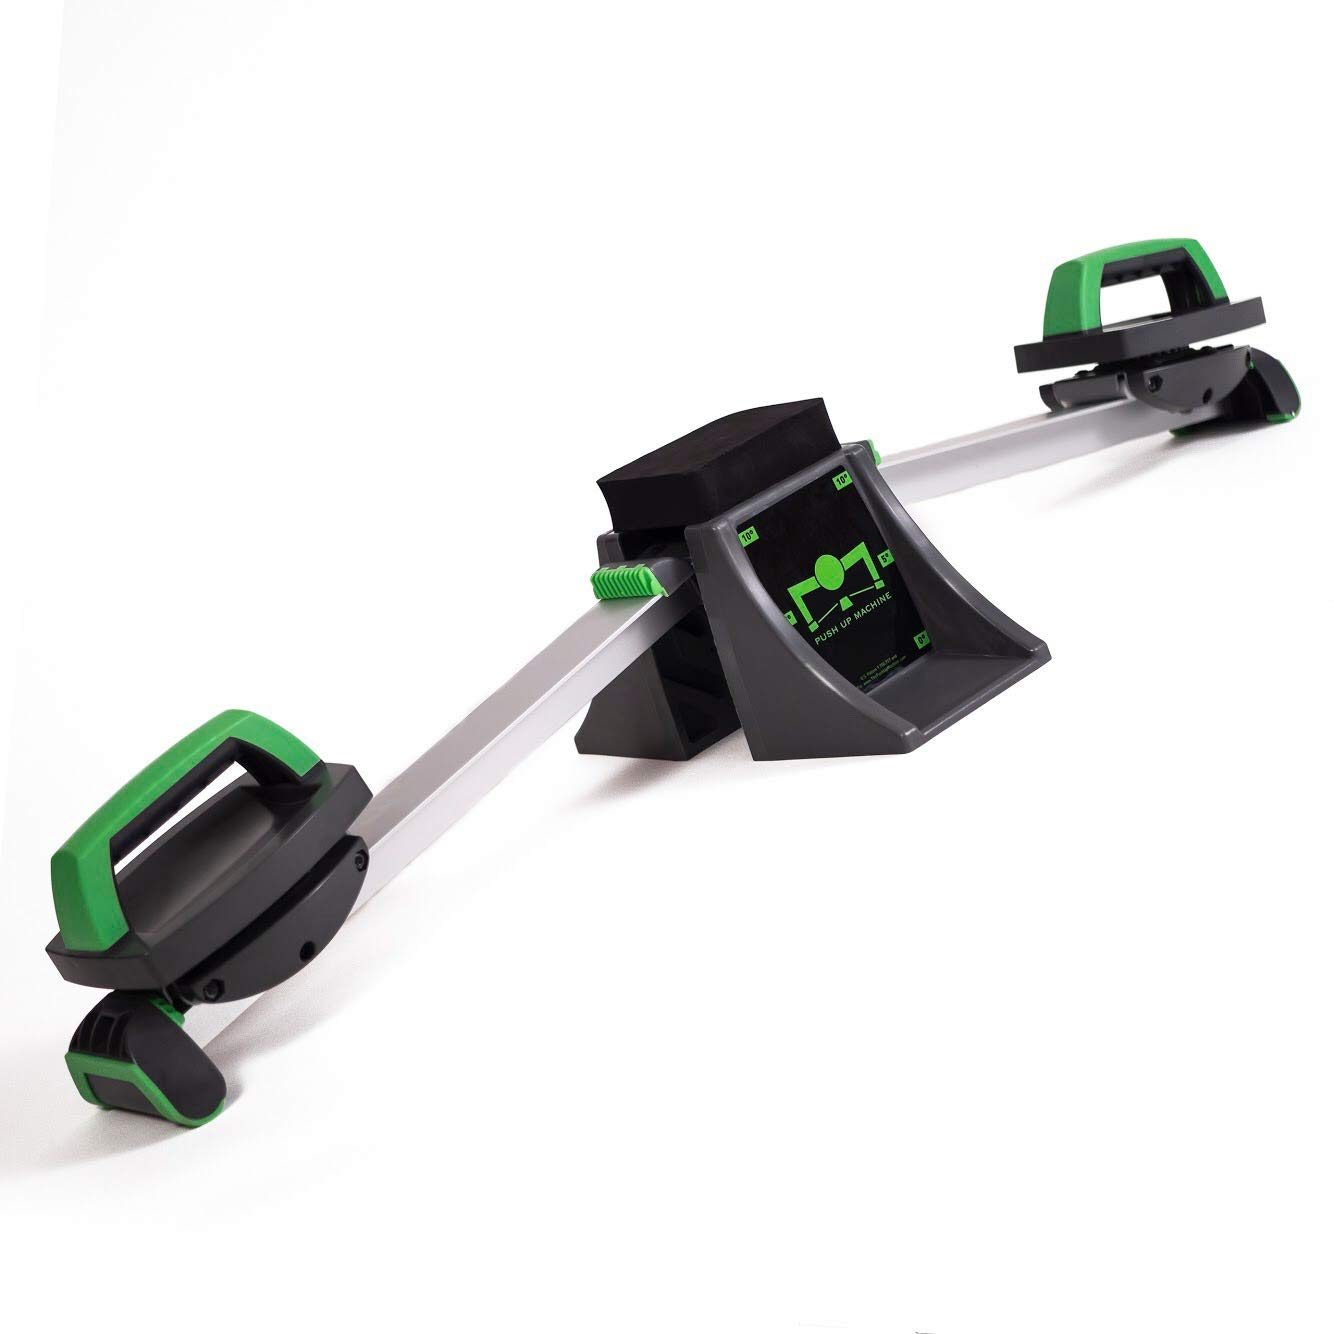 Push Up Machine - Professional Home Exercise Equipment